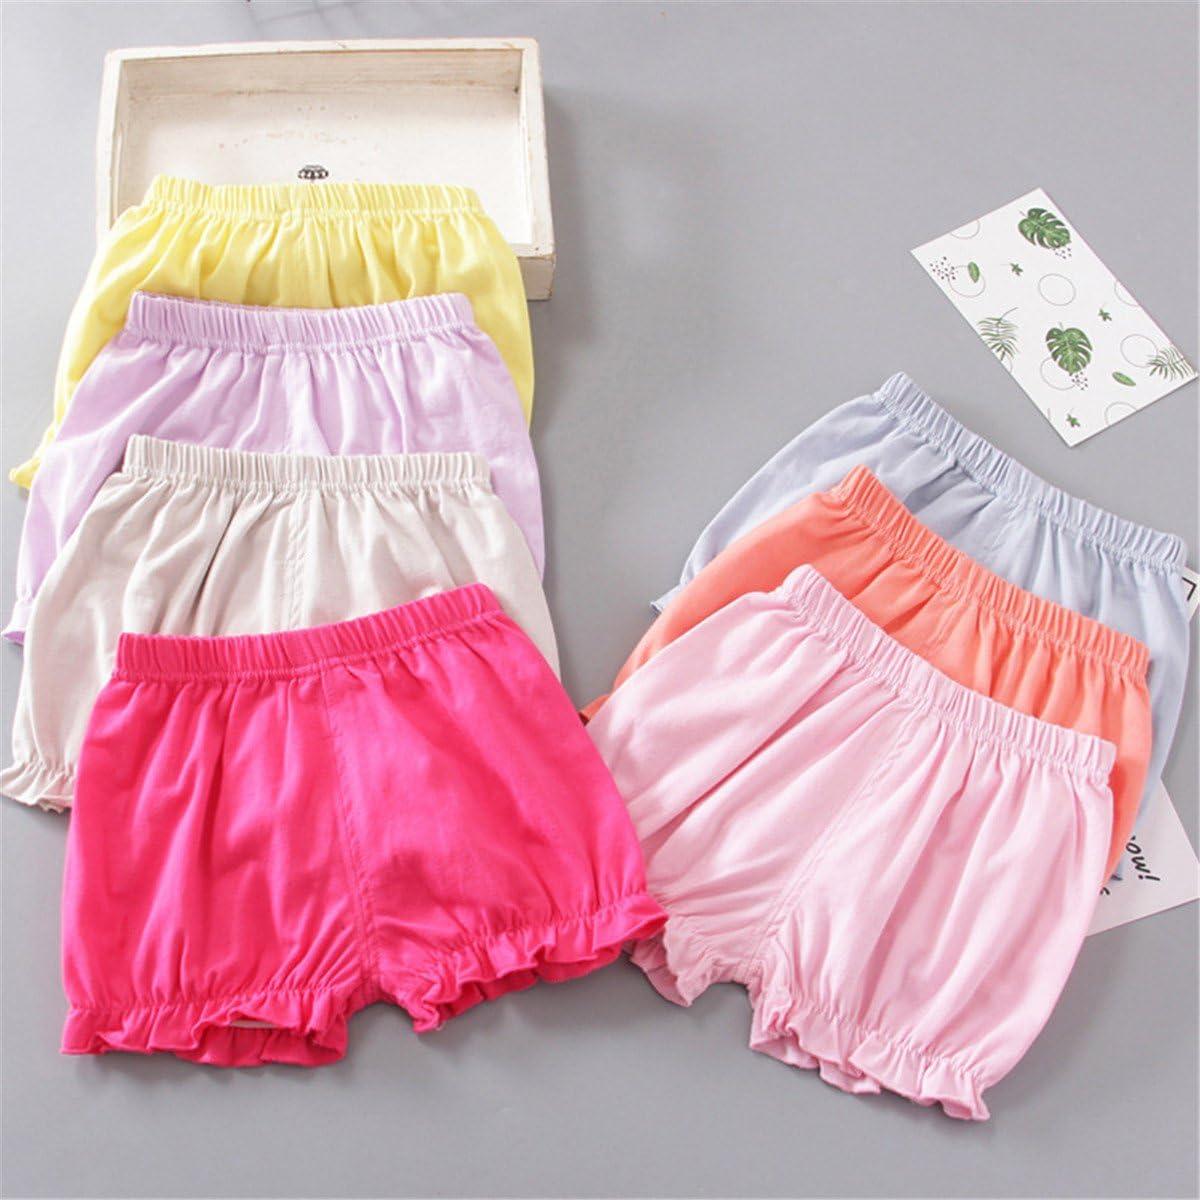 JELEUON 3Pcs Little Baby Girls Summer Soild Color Cotton Blend Bloomer Shorts Panties